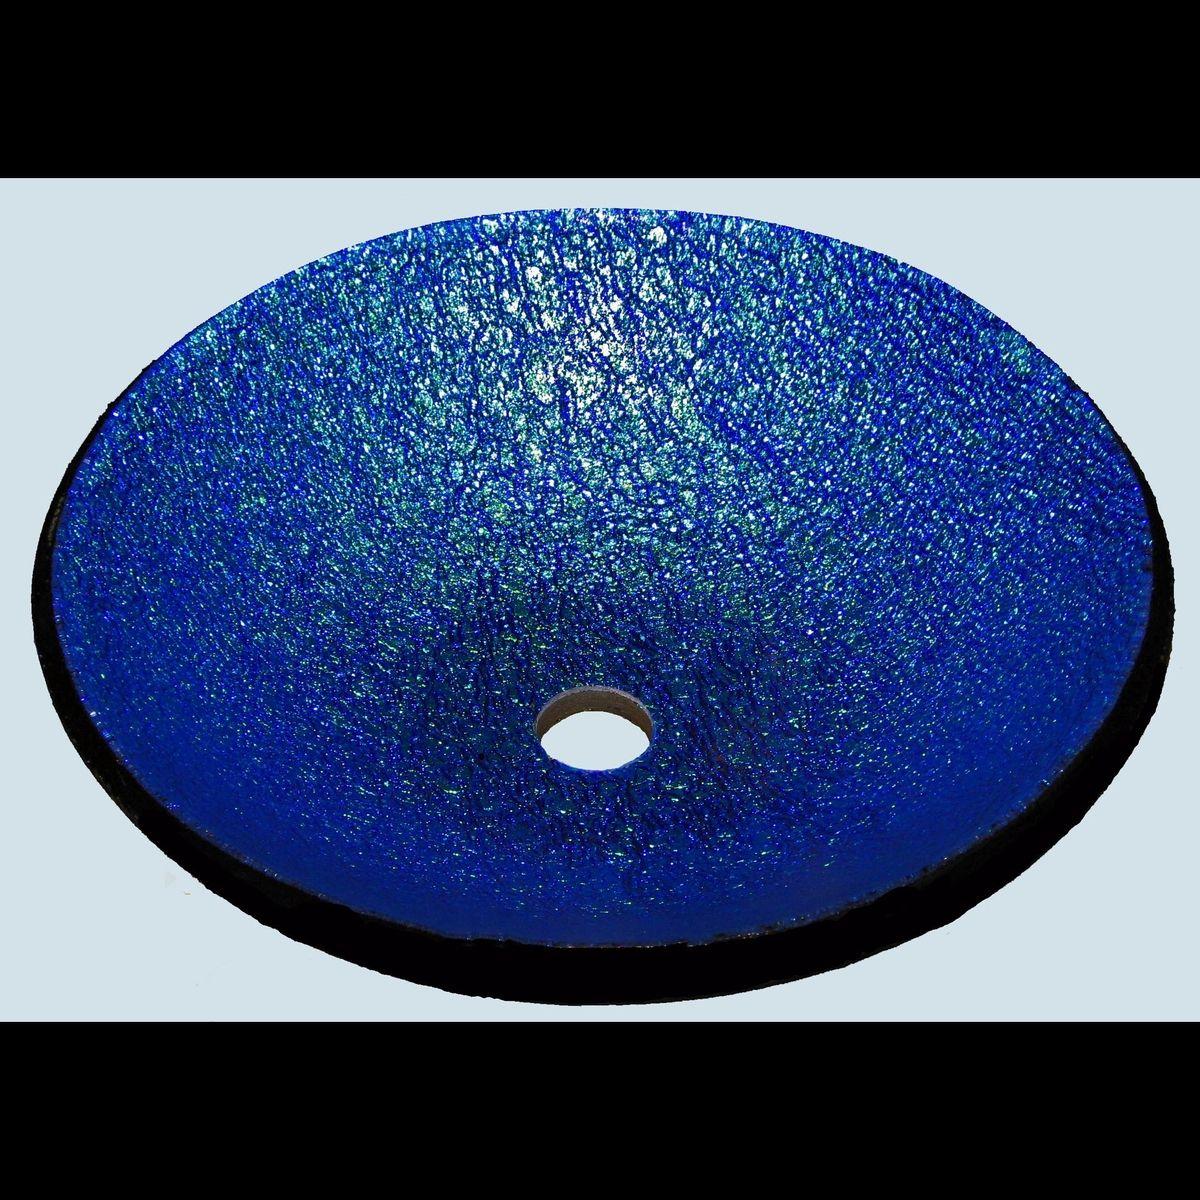 Custom Dichroic Glass Vessel Sink by Stouffer Studios - Art Glass ...